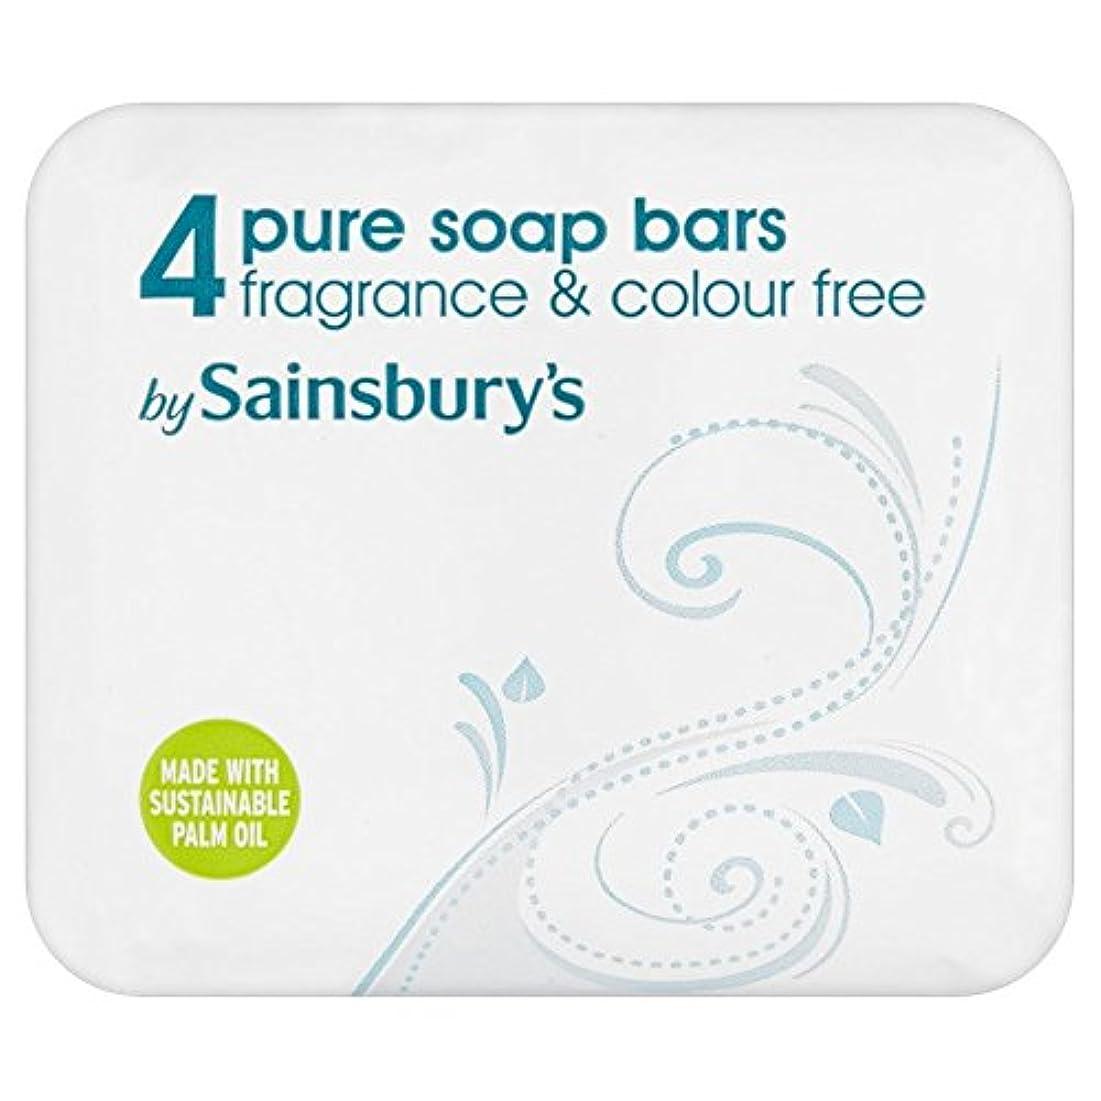 Sainsbury's Pure Soap 4x125g - (Sainsbury's) 純粋な石鹸4X125G [並行輸入品]